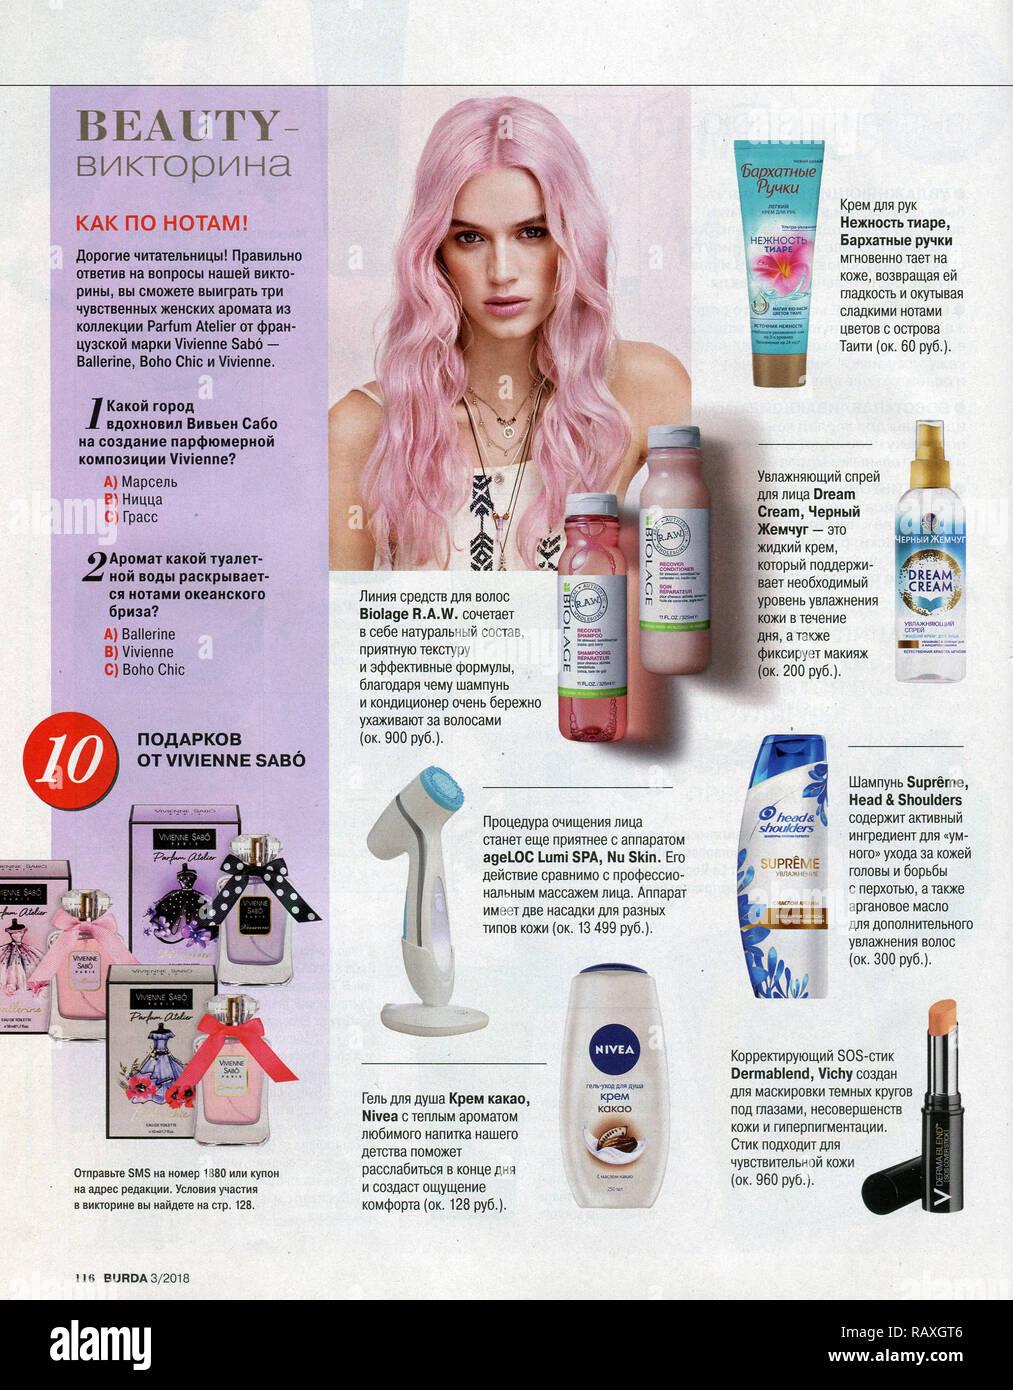 The inside of Russian magazine 'Burda'. - Stock Image